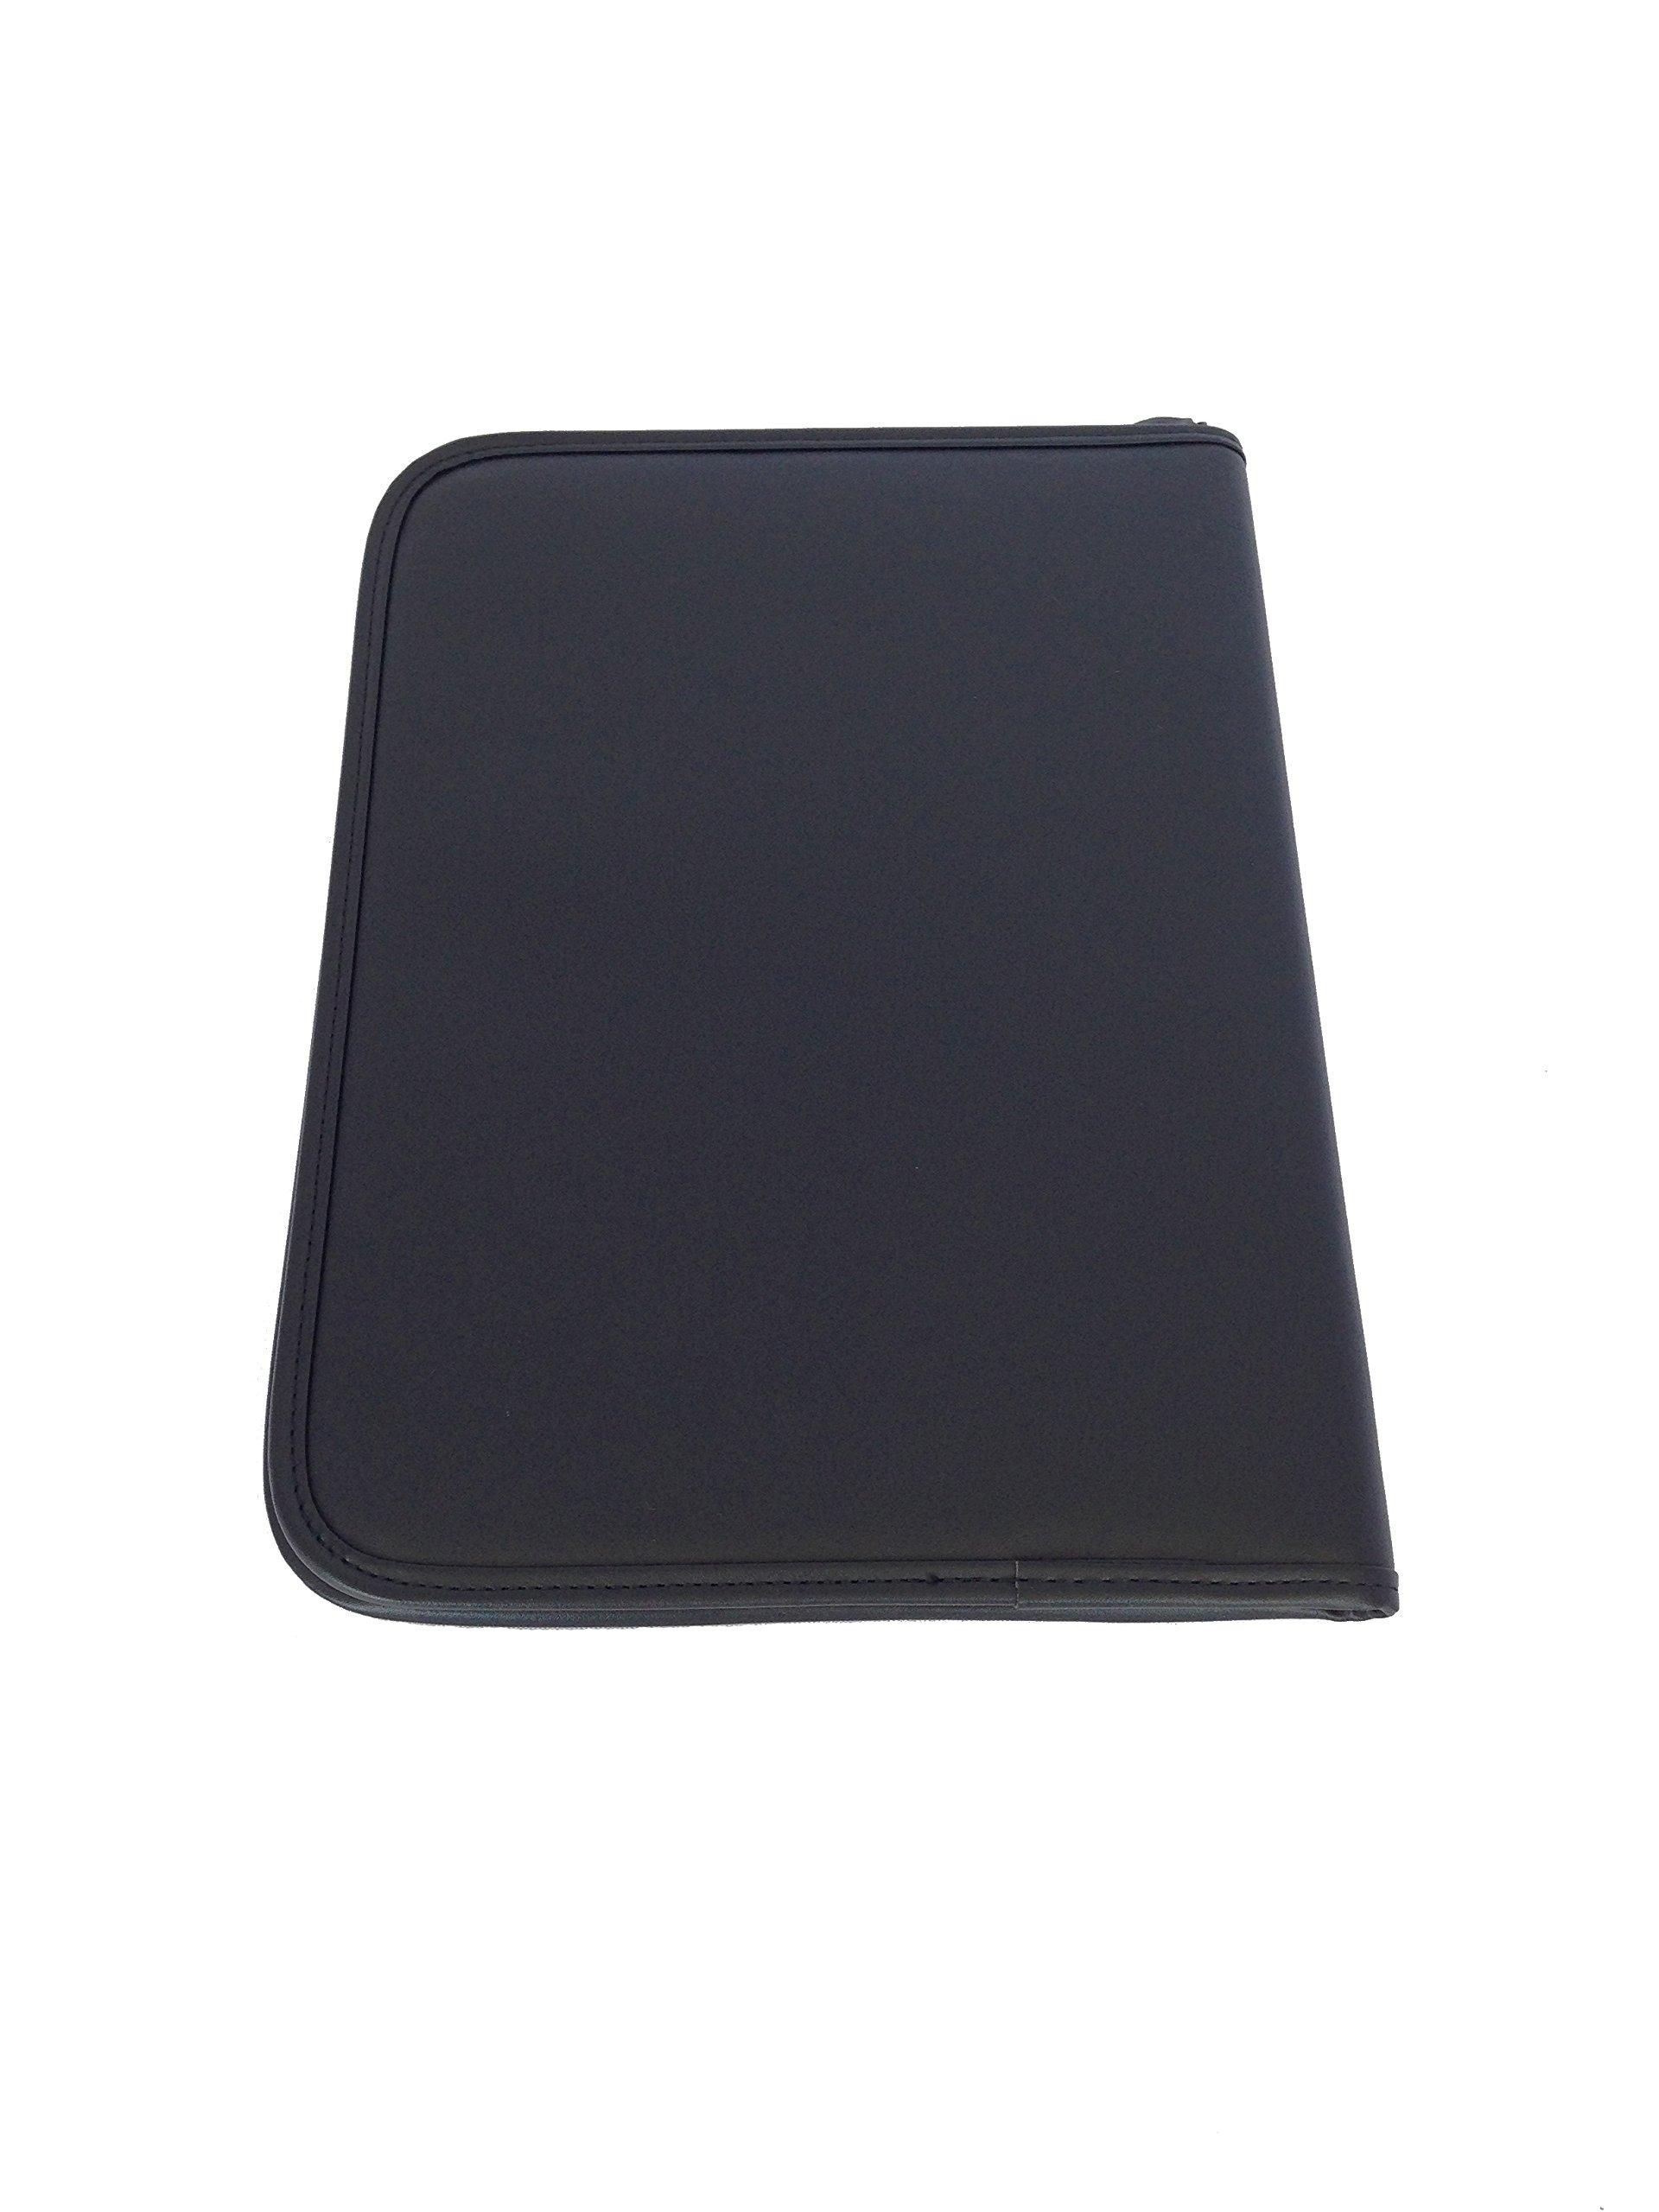 ImpecGear Padfolio Zippered Portfolio Interior 10.1 Inch Tablet Sleeve, Organizer Document Holder W/ Notepad & Pen Slot, Calculator (10'' x 13.5'' x 1.5'') by ImpecGear (Image #4)